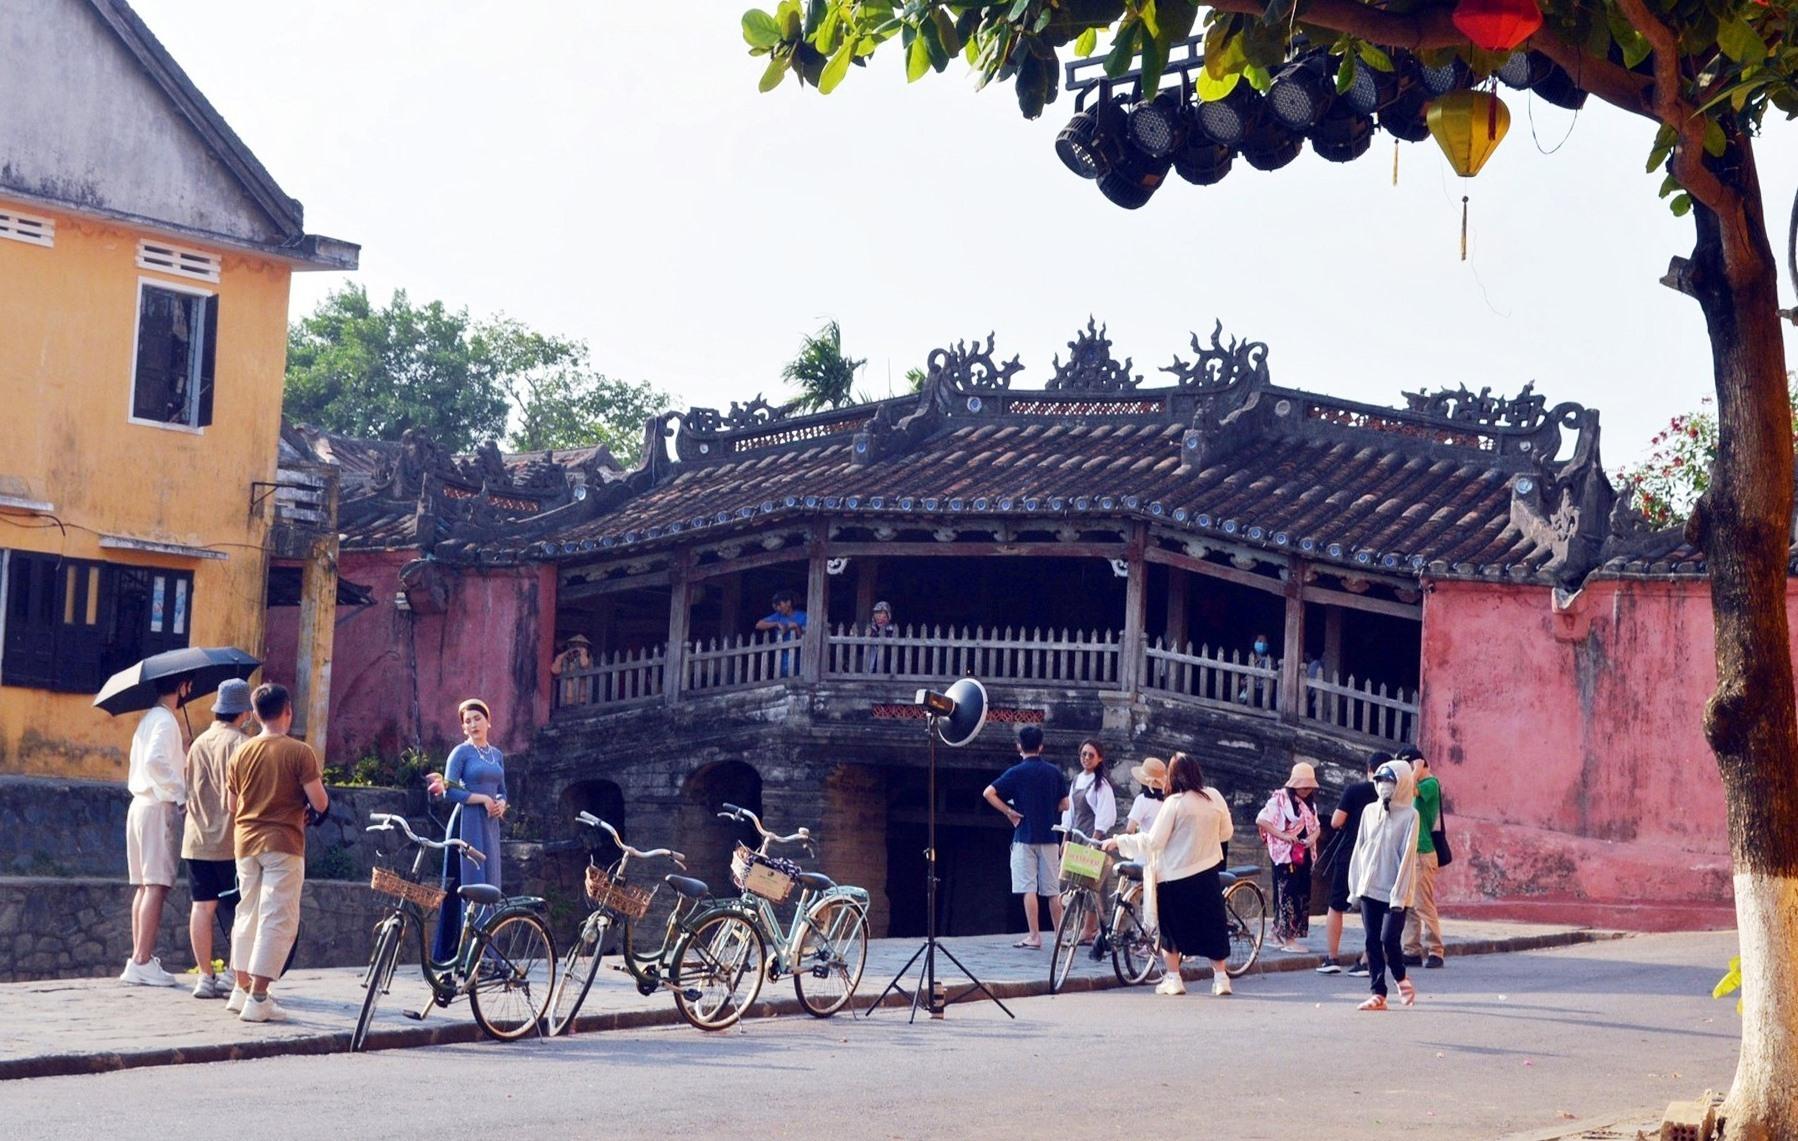 Japanese Bridge in Hoi An, Quang Nam